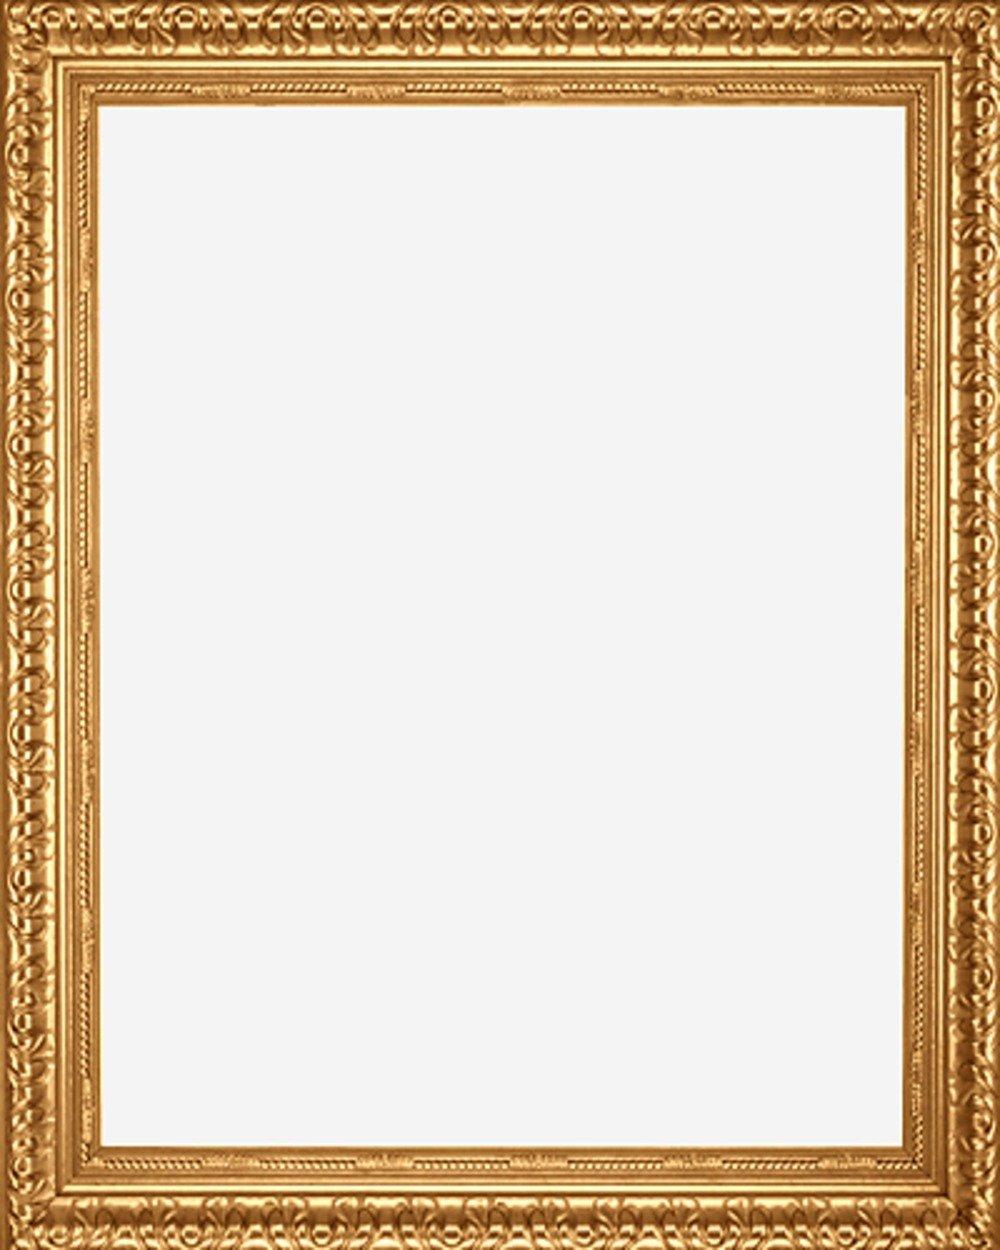 dfc738744a9 Amazon.com - Art Oyster Designer 12x18 Antique Gold Finish Picture Frame